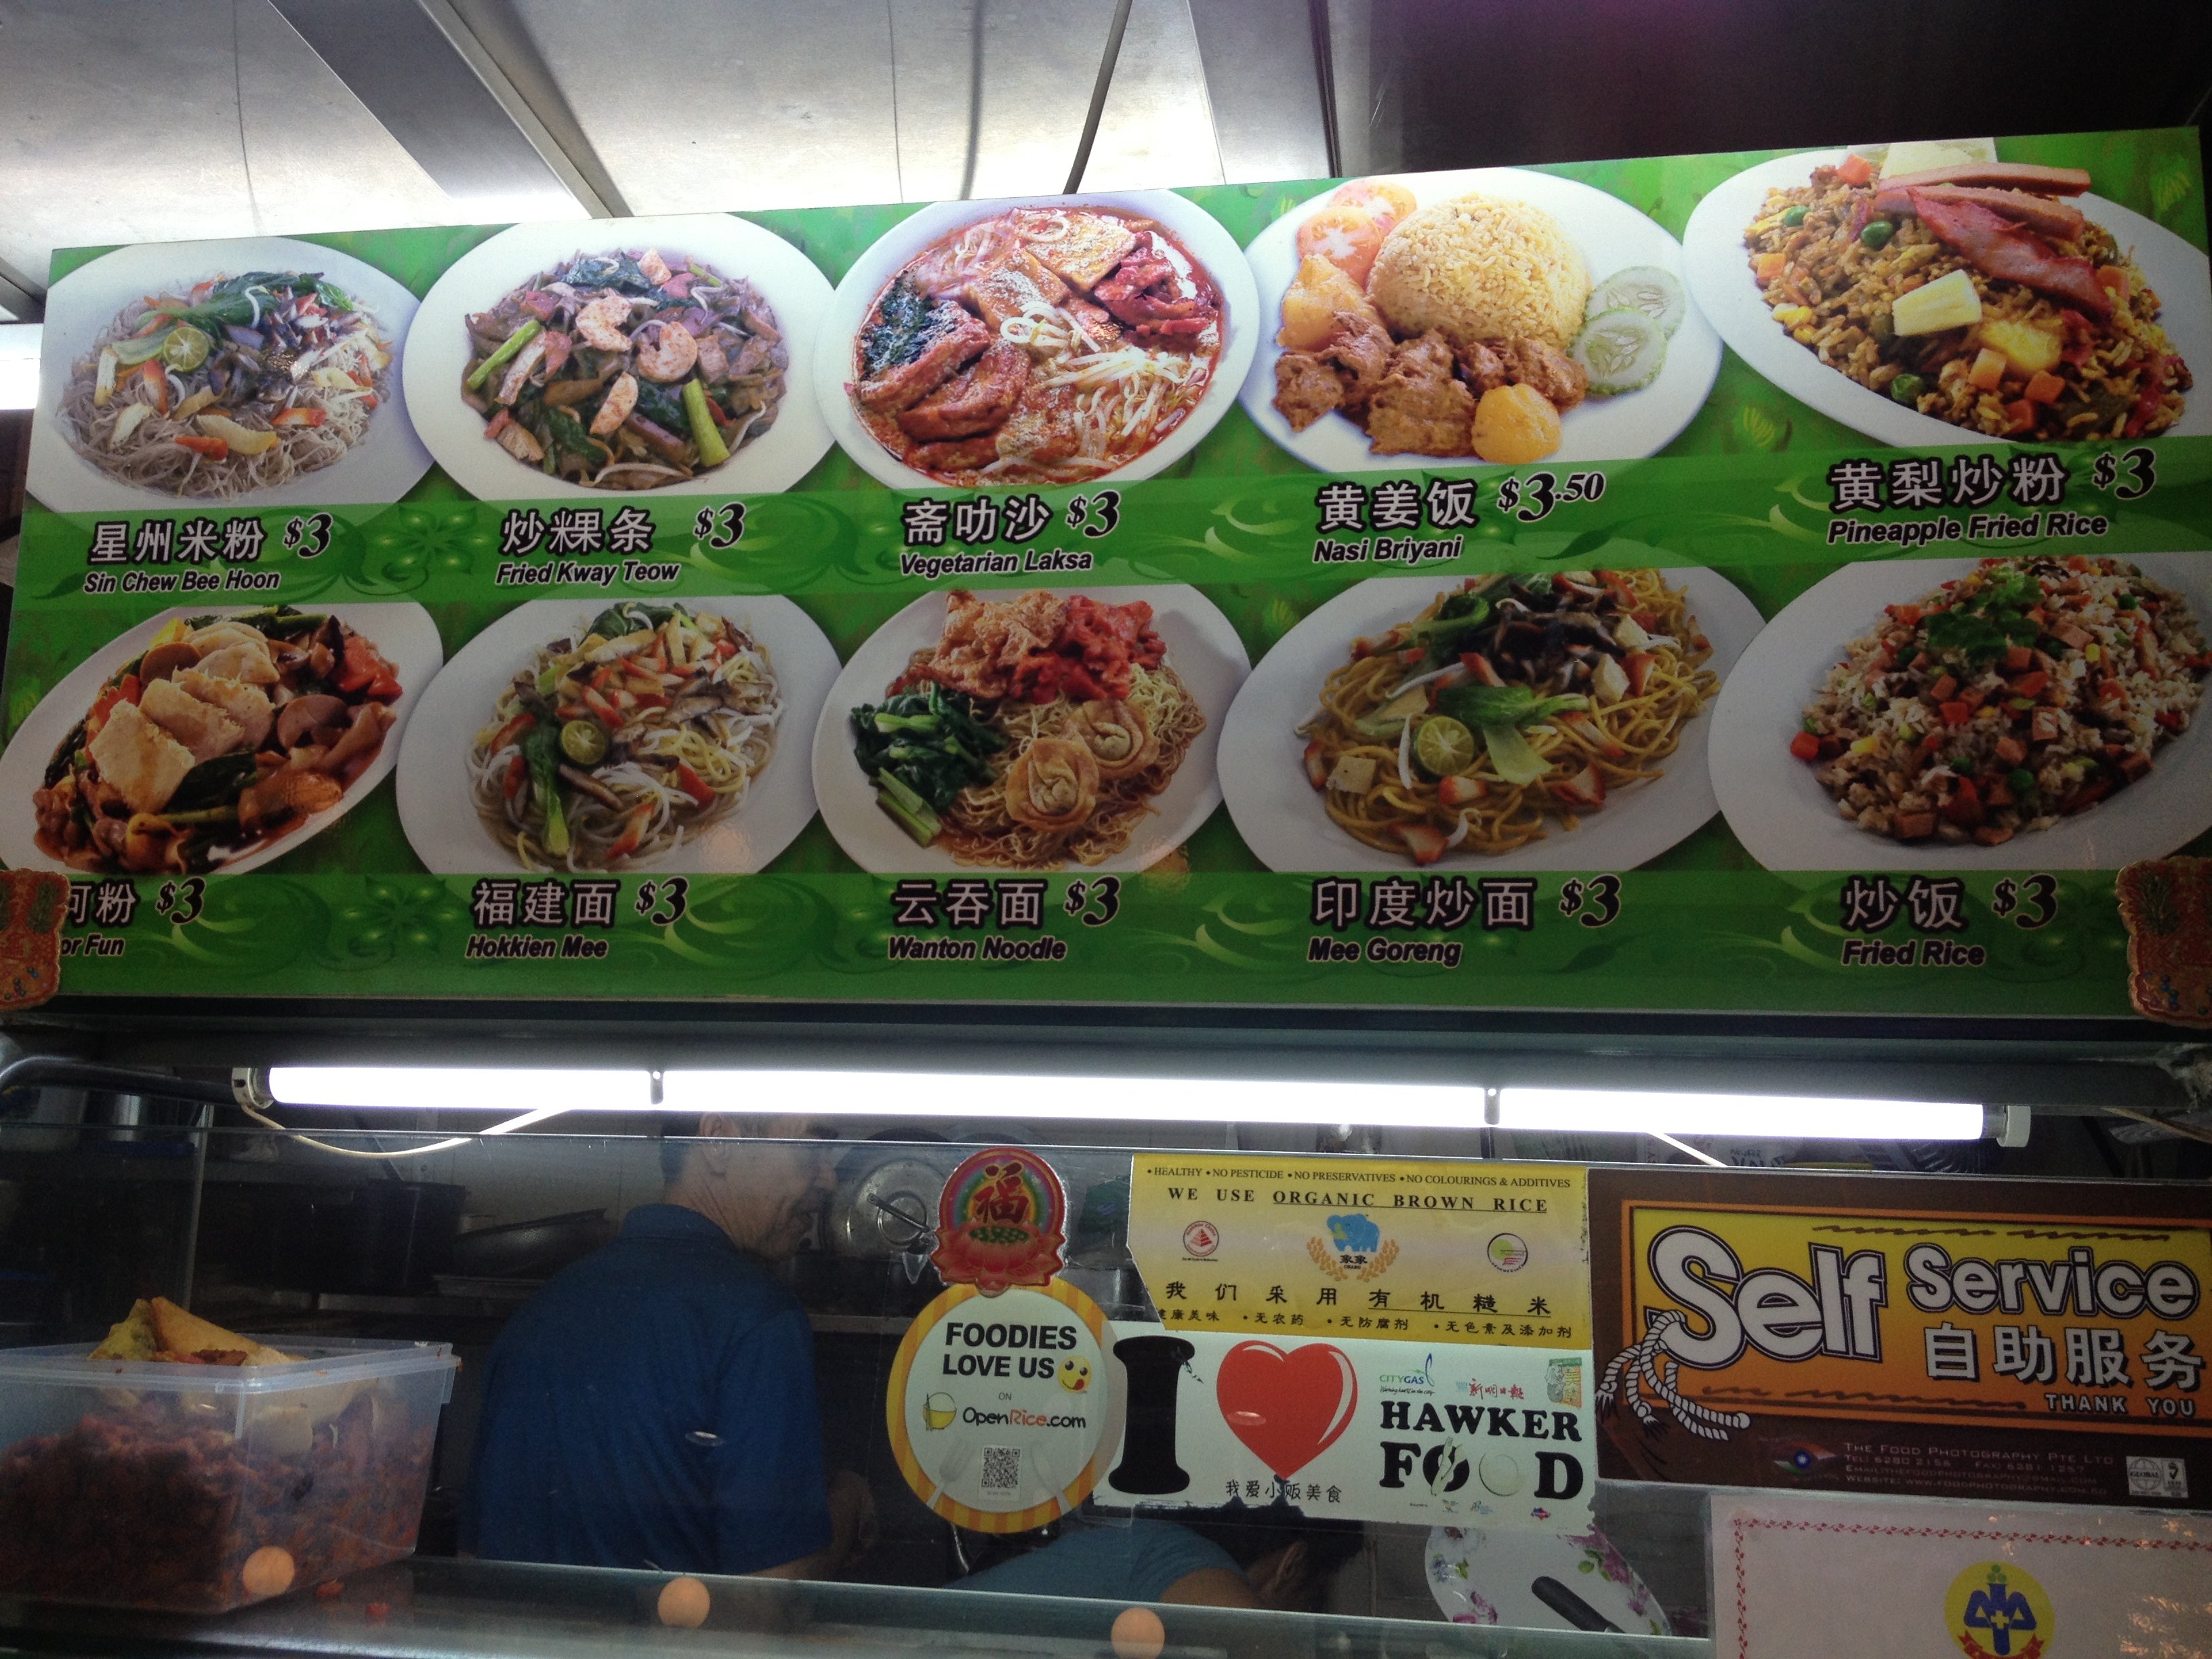 Amoy Street Food Centre Vegetarian